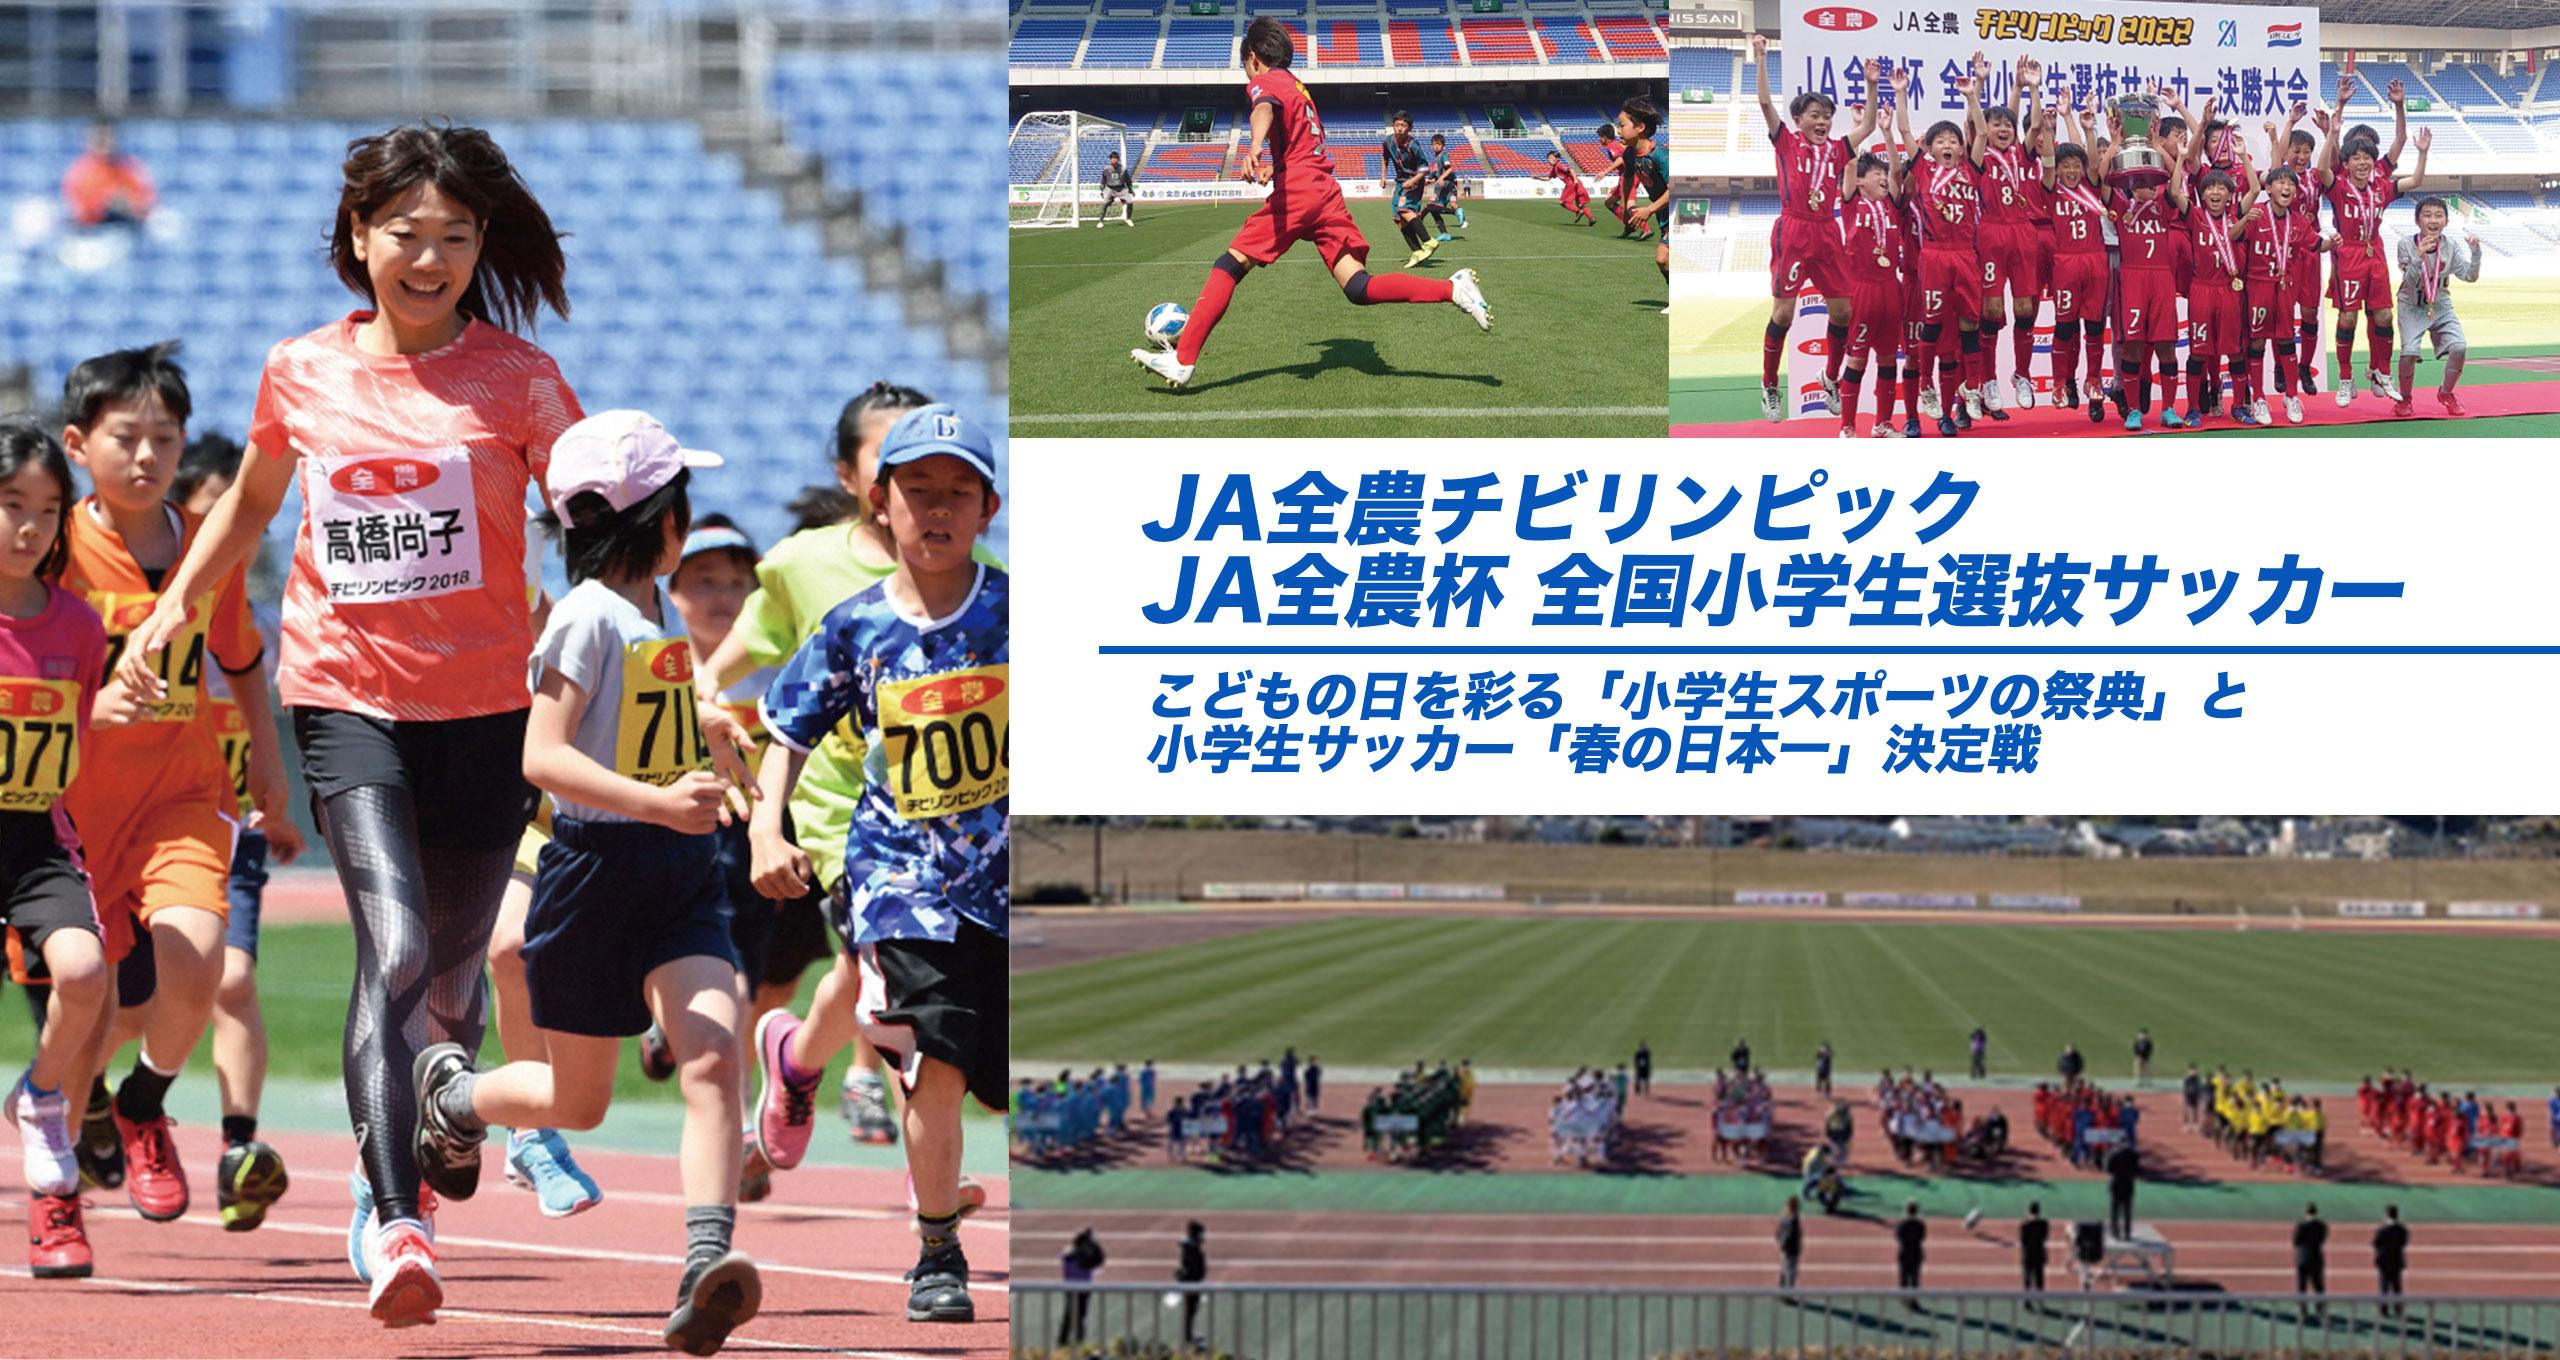 JA全農チビリンピック JA全農杯 全国小学生選抜サッカー